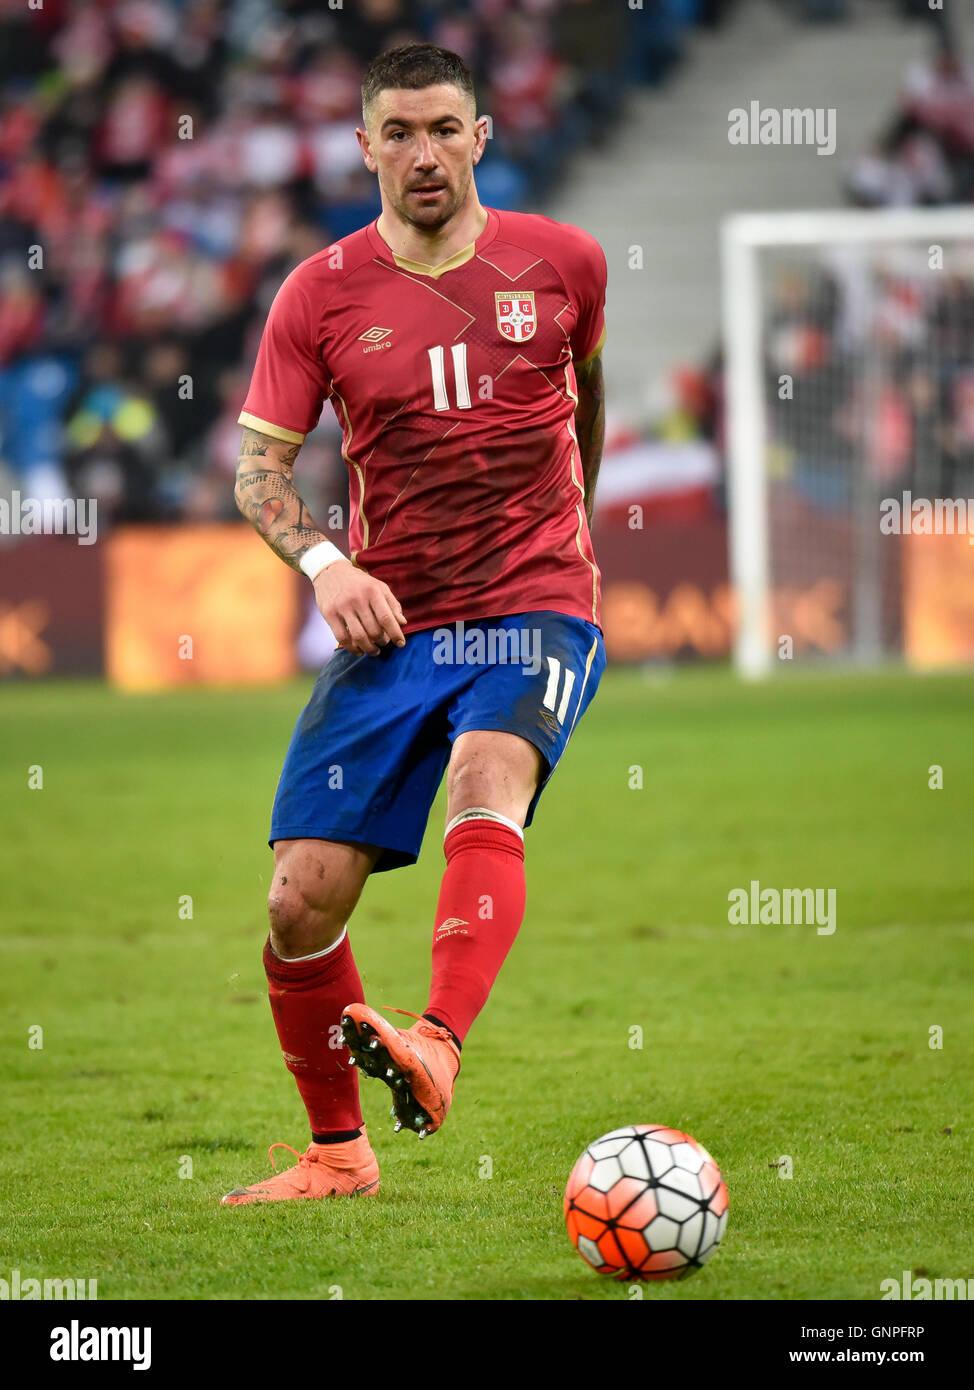 POZNAN, POLAND - MARCH 23, 2016: Aleksandar Kolarov in action during International Football friendly match Poland - Stock Image